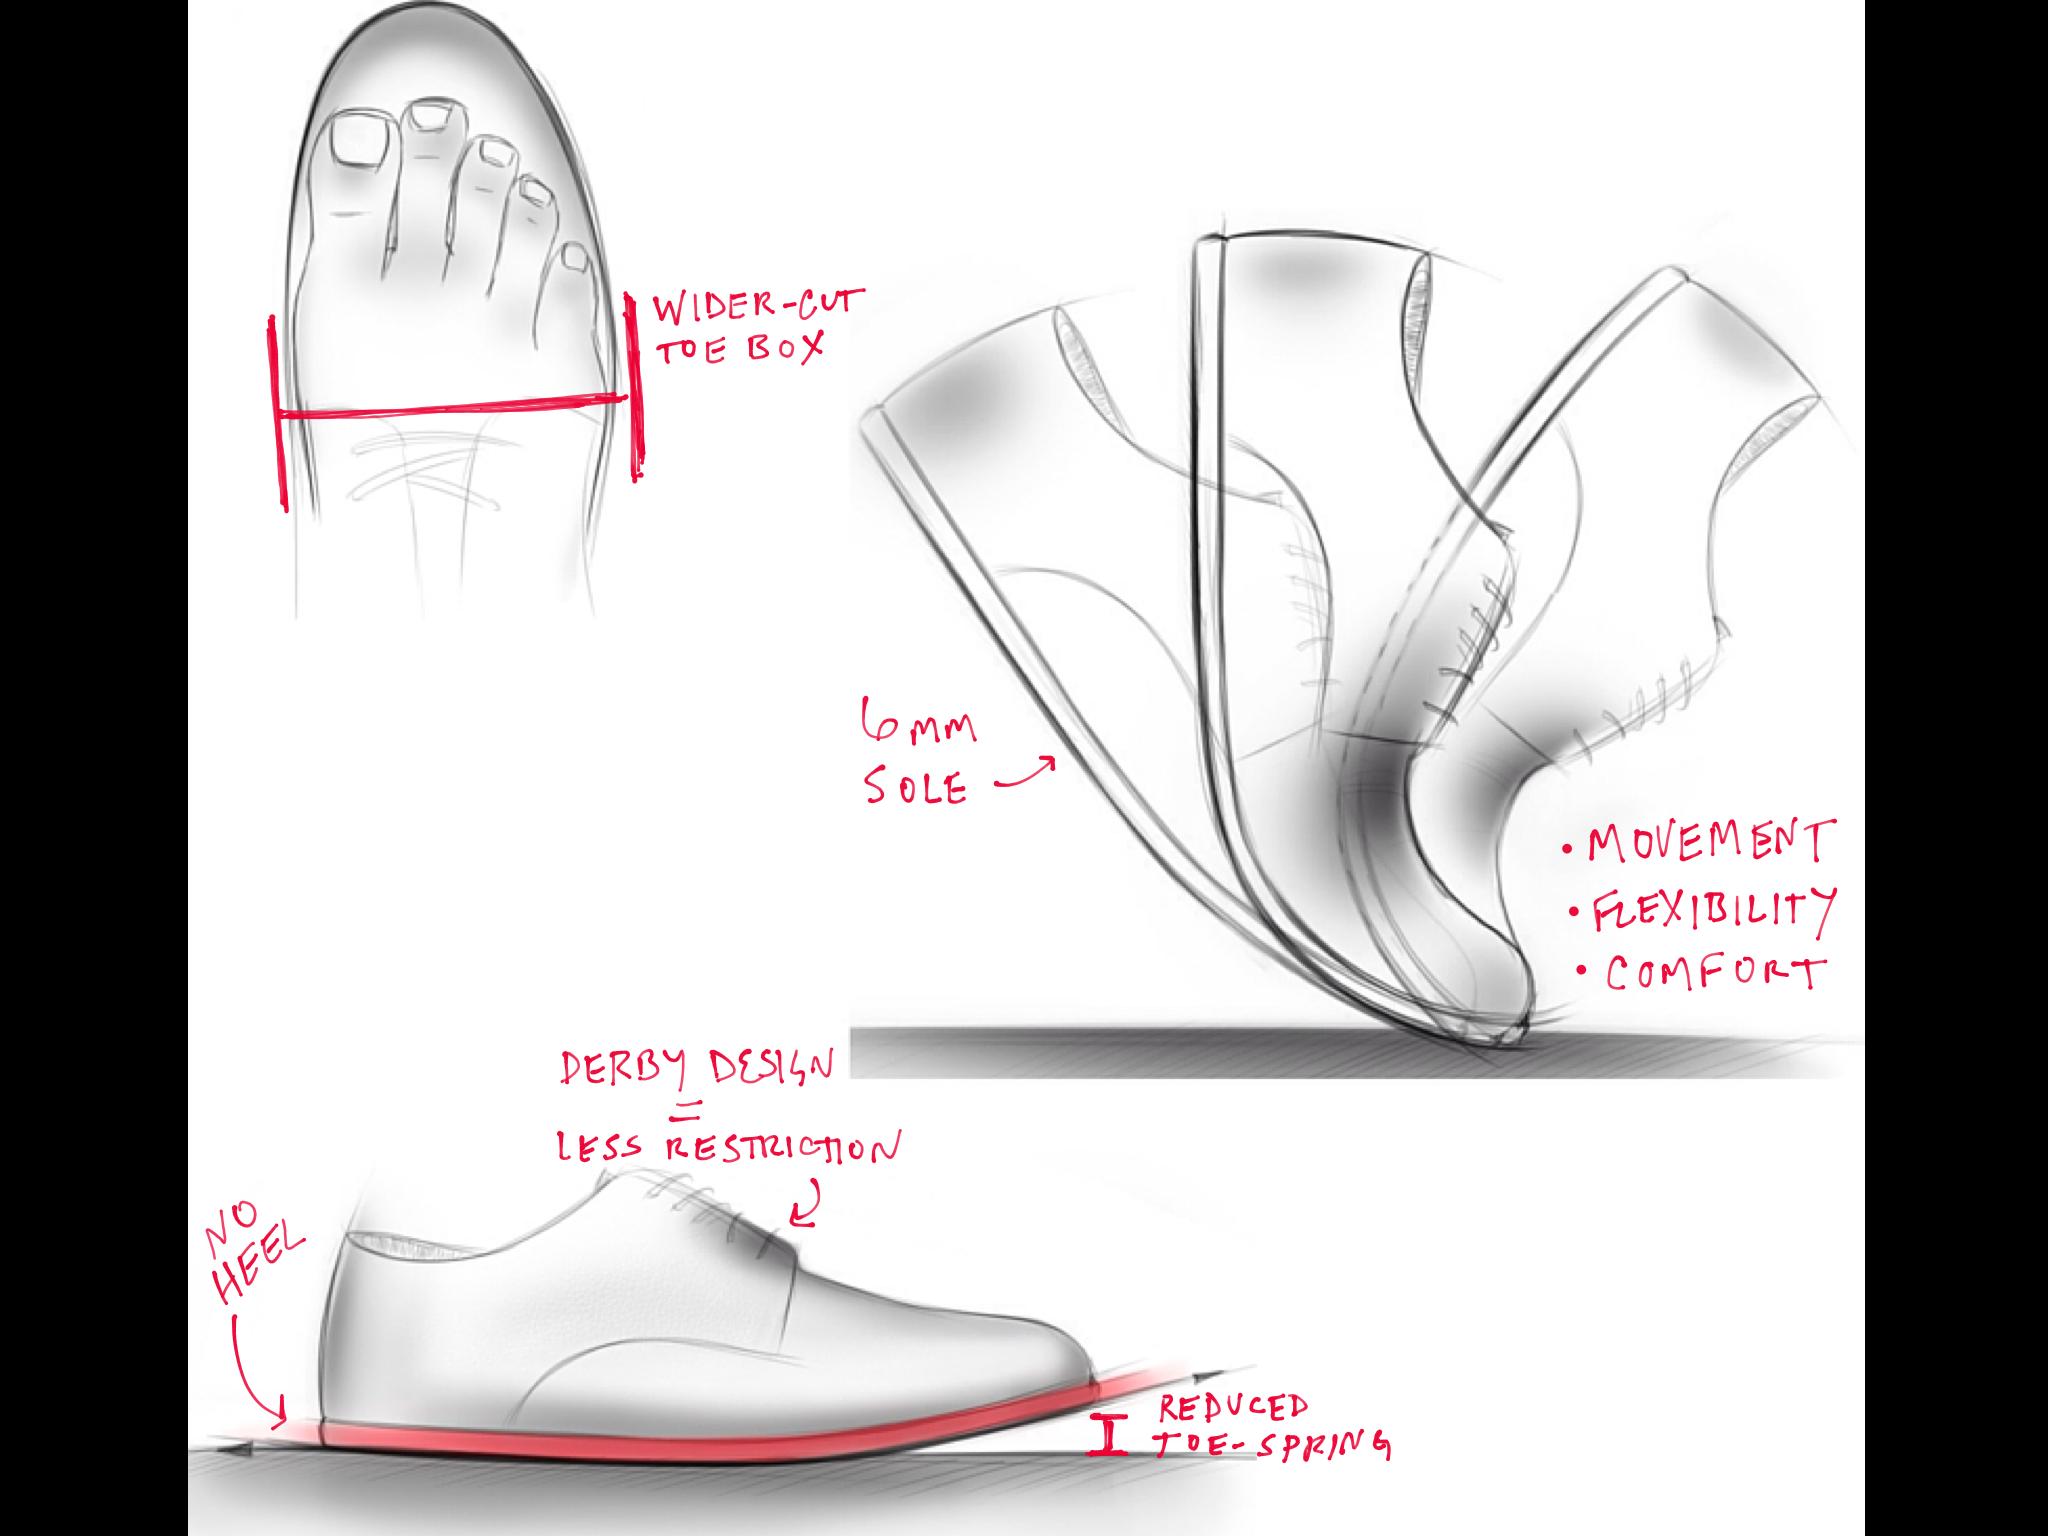 ICANCHU Men's Minimalist Dress Shoes Supernatural Design